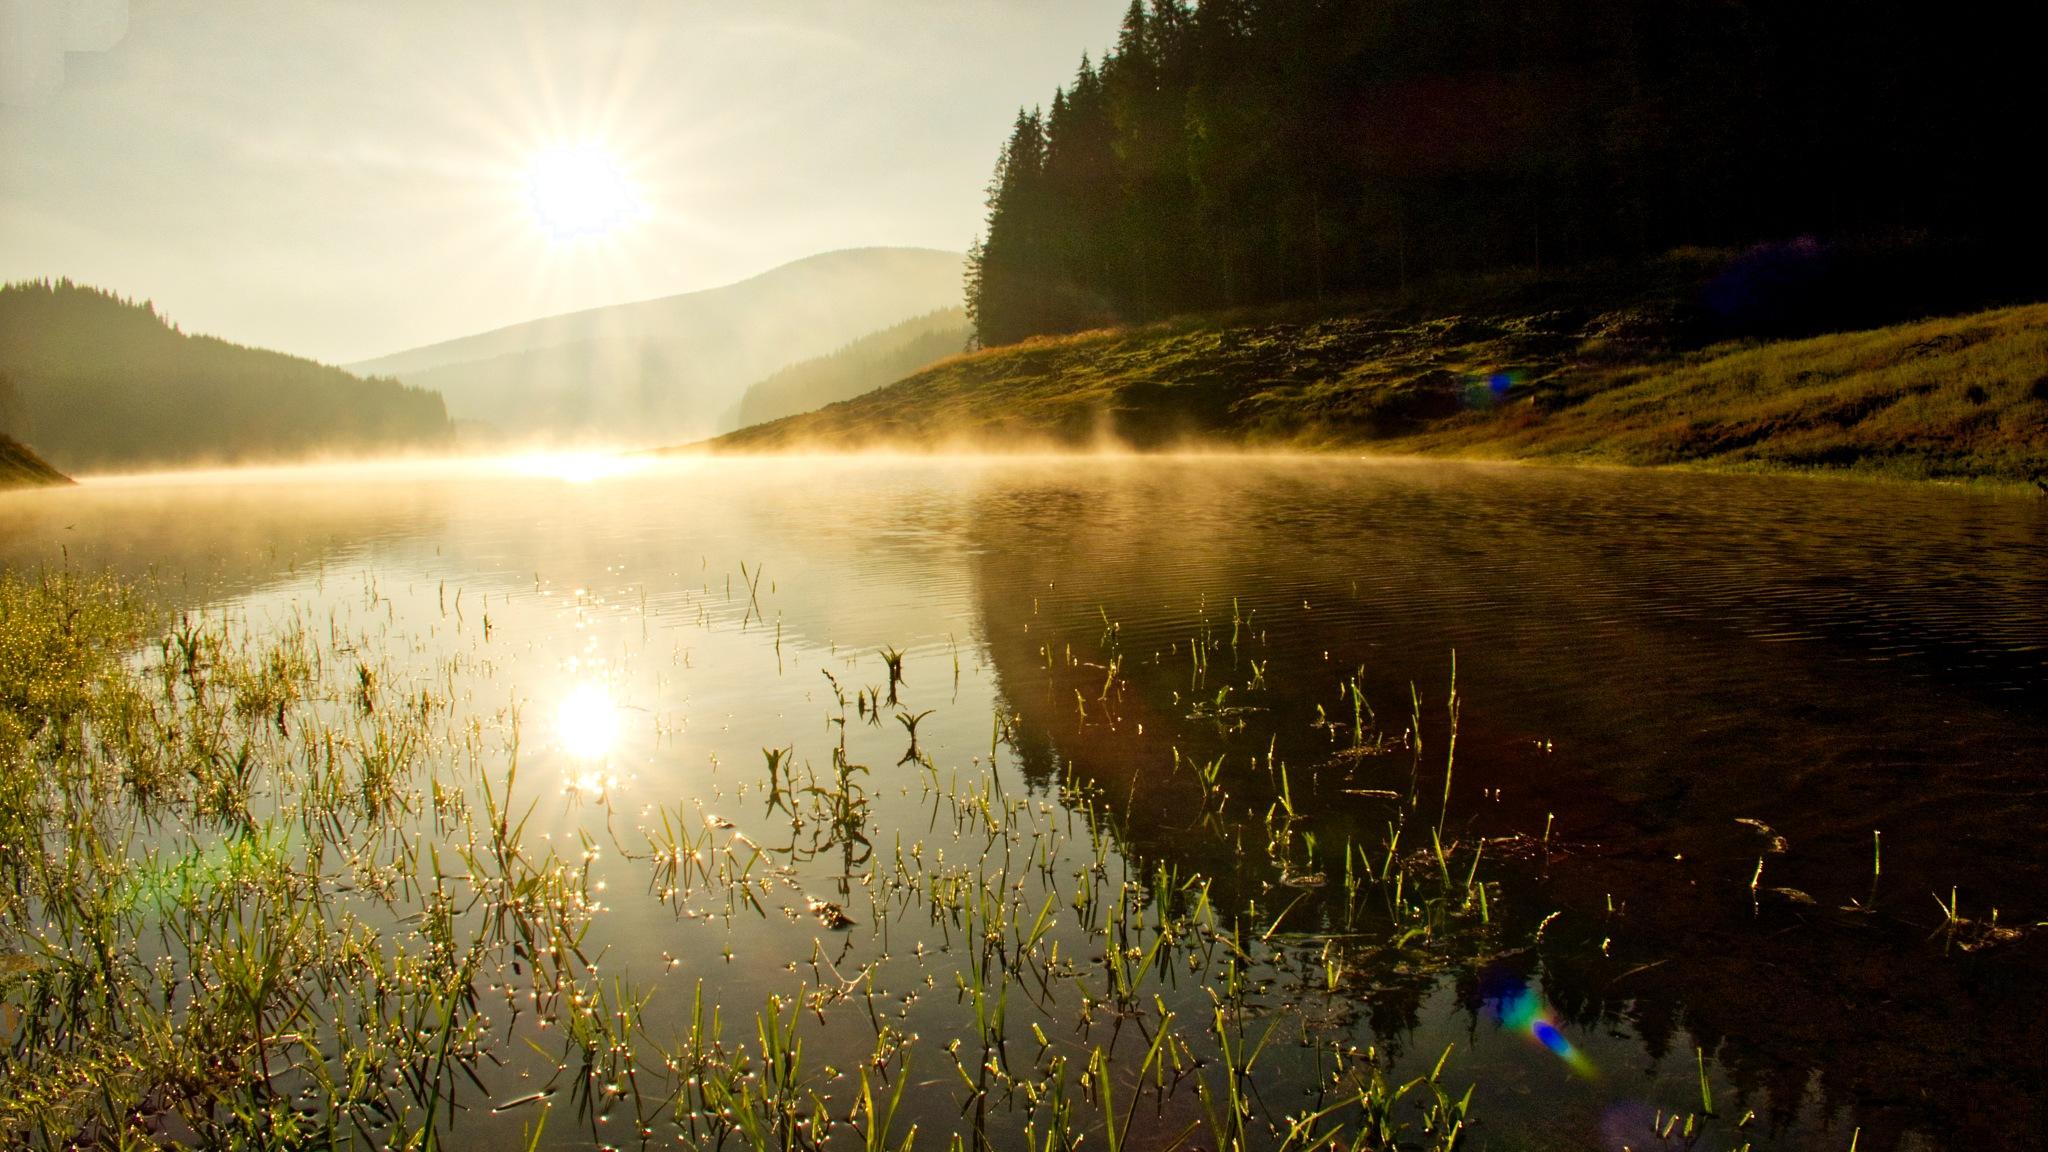 boiling waters at sunrise by Adi Gli